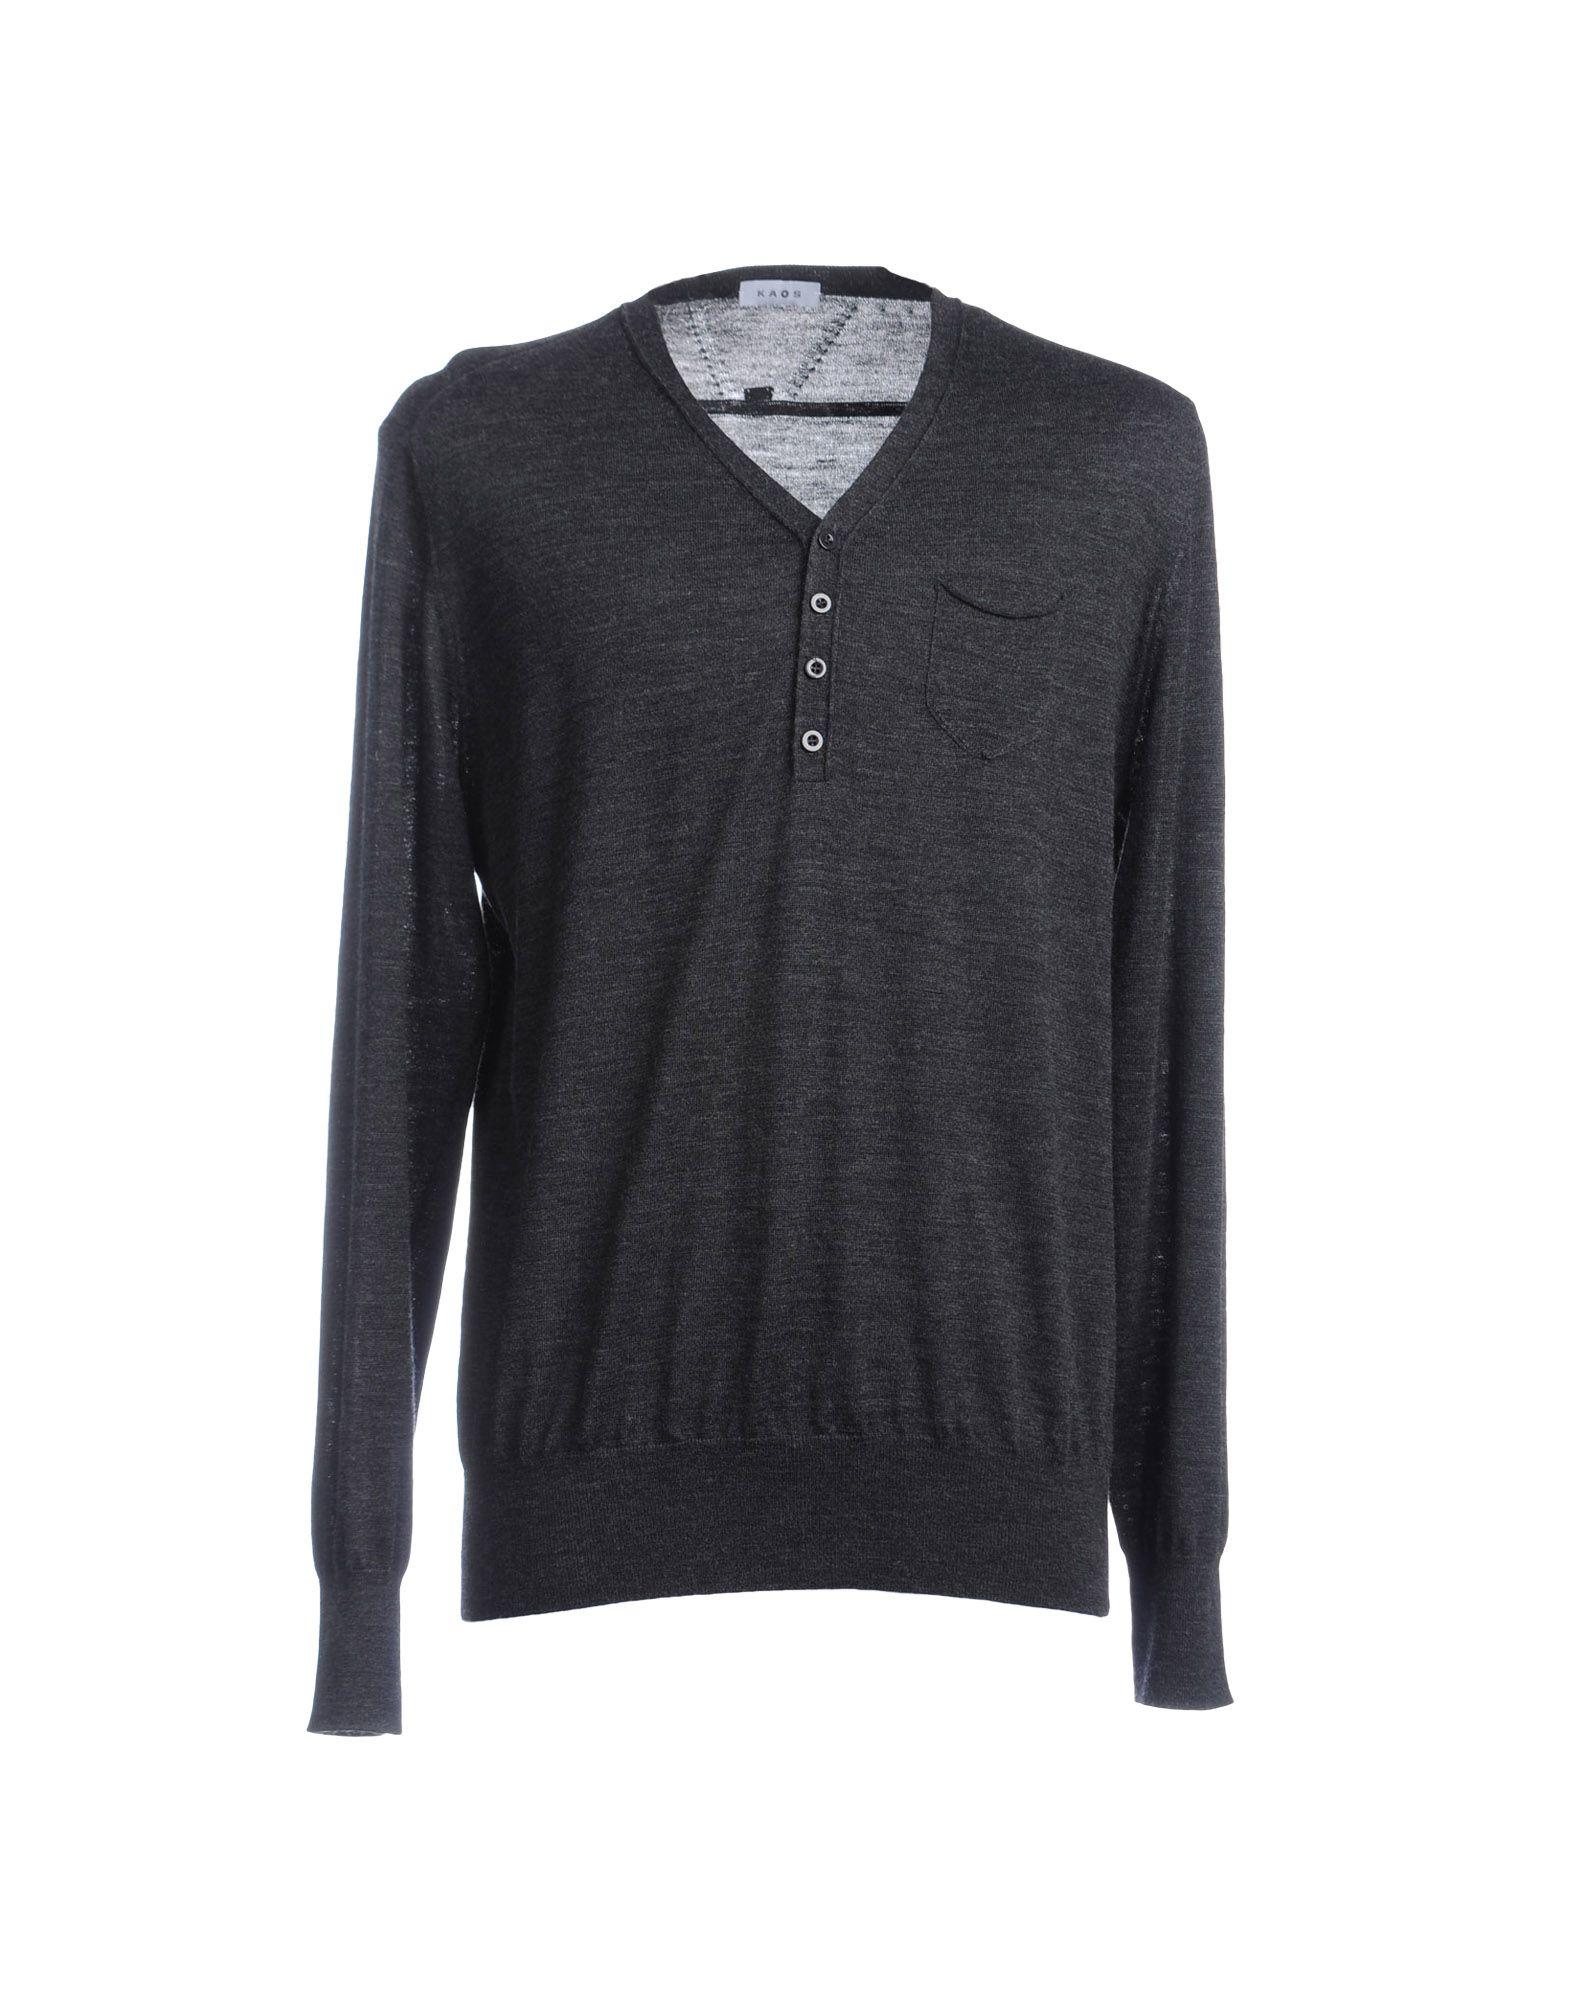 Kaos V-neck in Gray for Men (Steel grey)   Lyst